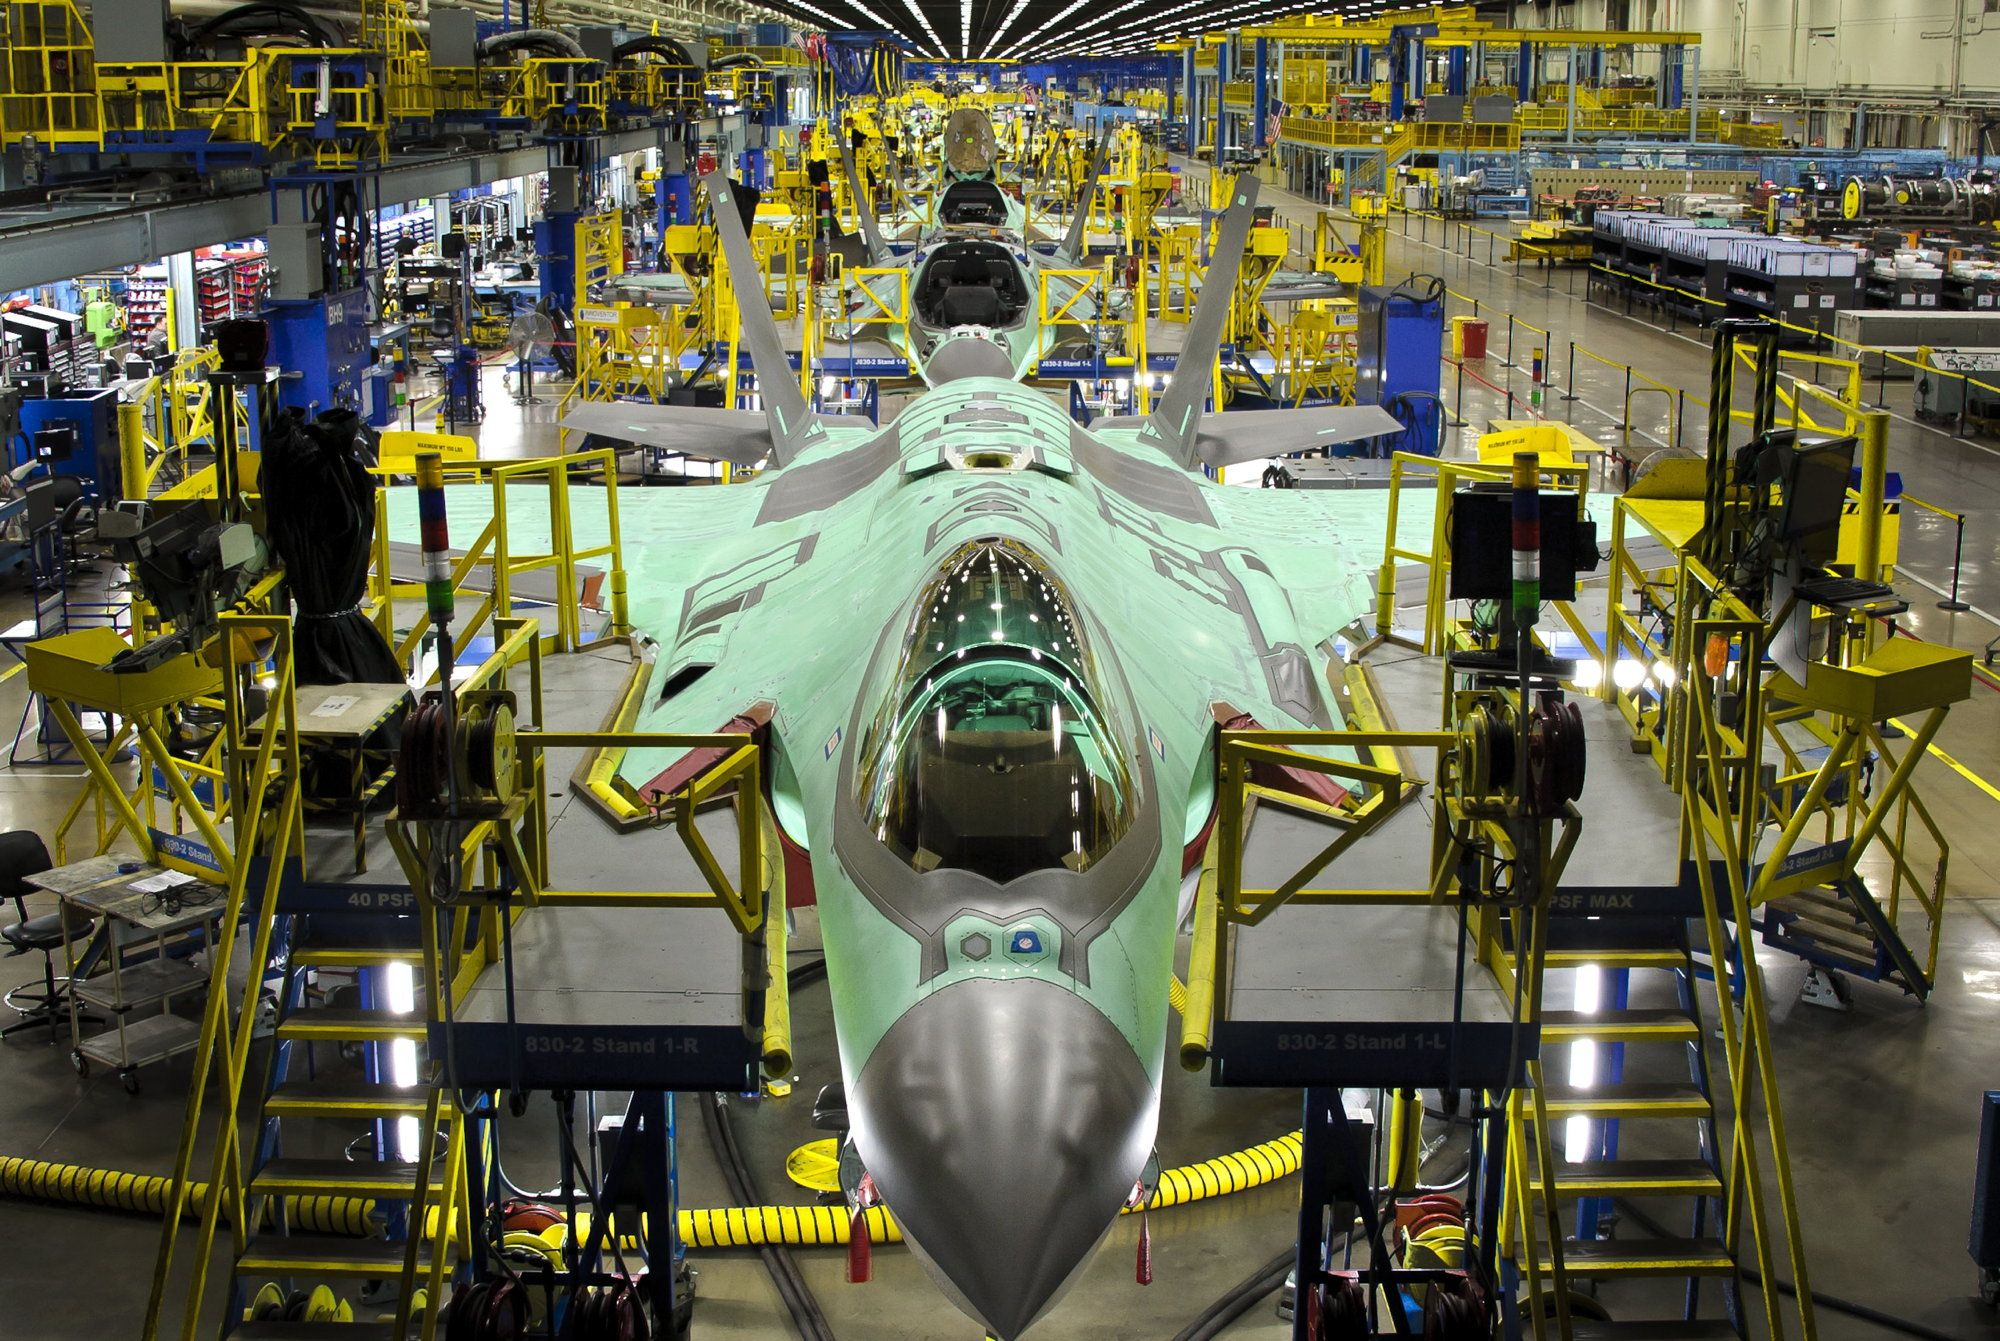 Photo of Τι μπορούμε να περιμένουμε, εκτός της Πολεμικής Αεροπορίας, από την προμήθεια 24 F-35;